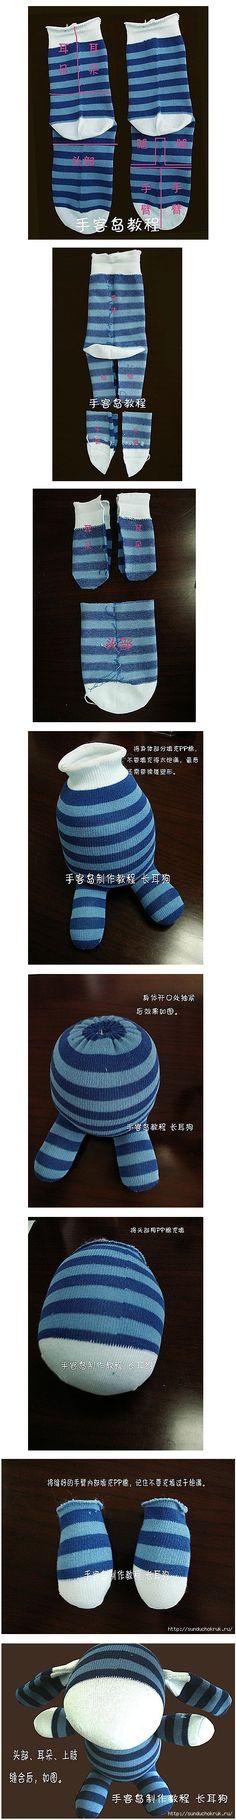 muñeco de calcetin